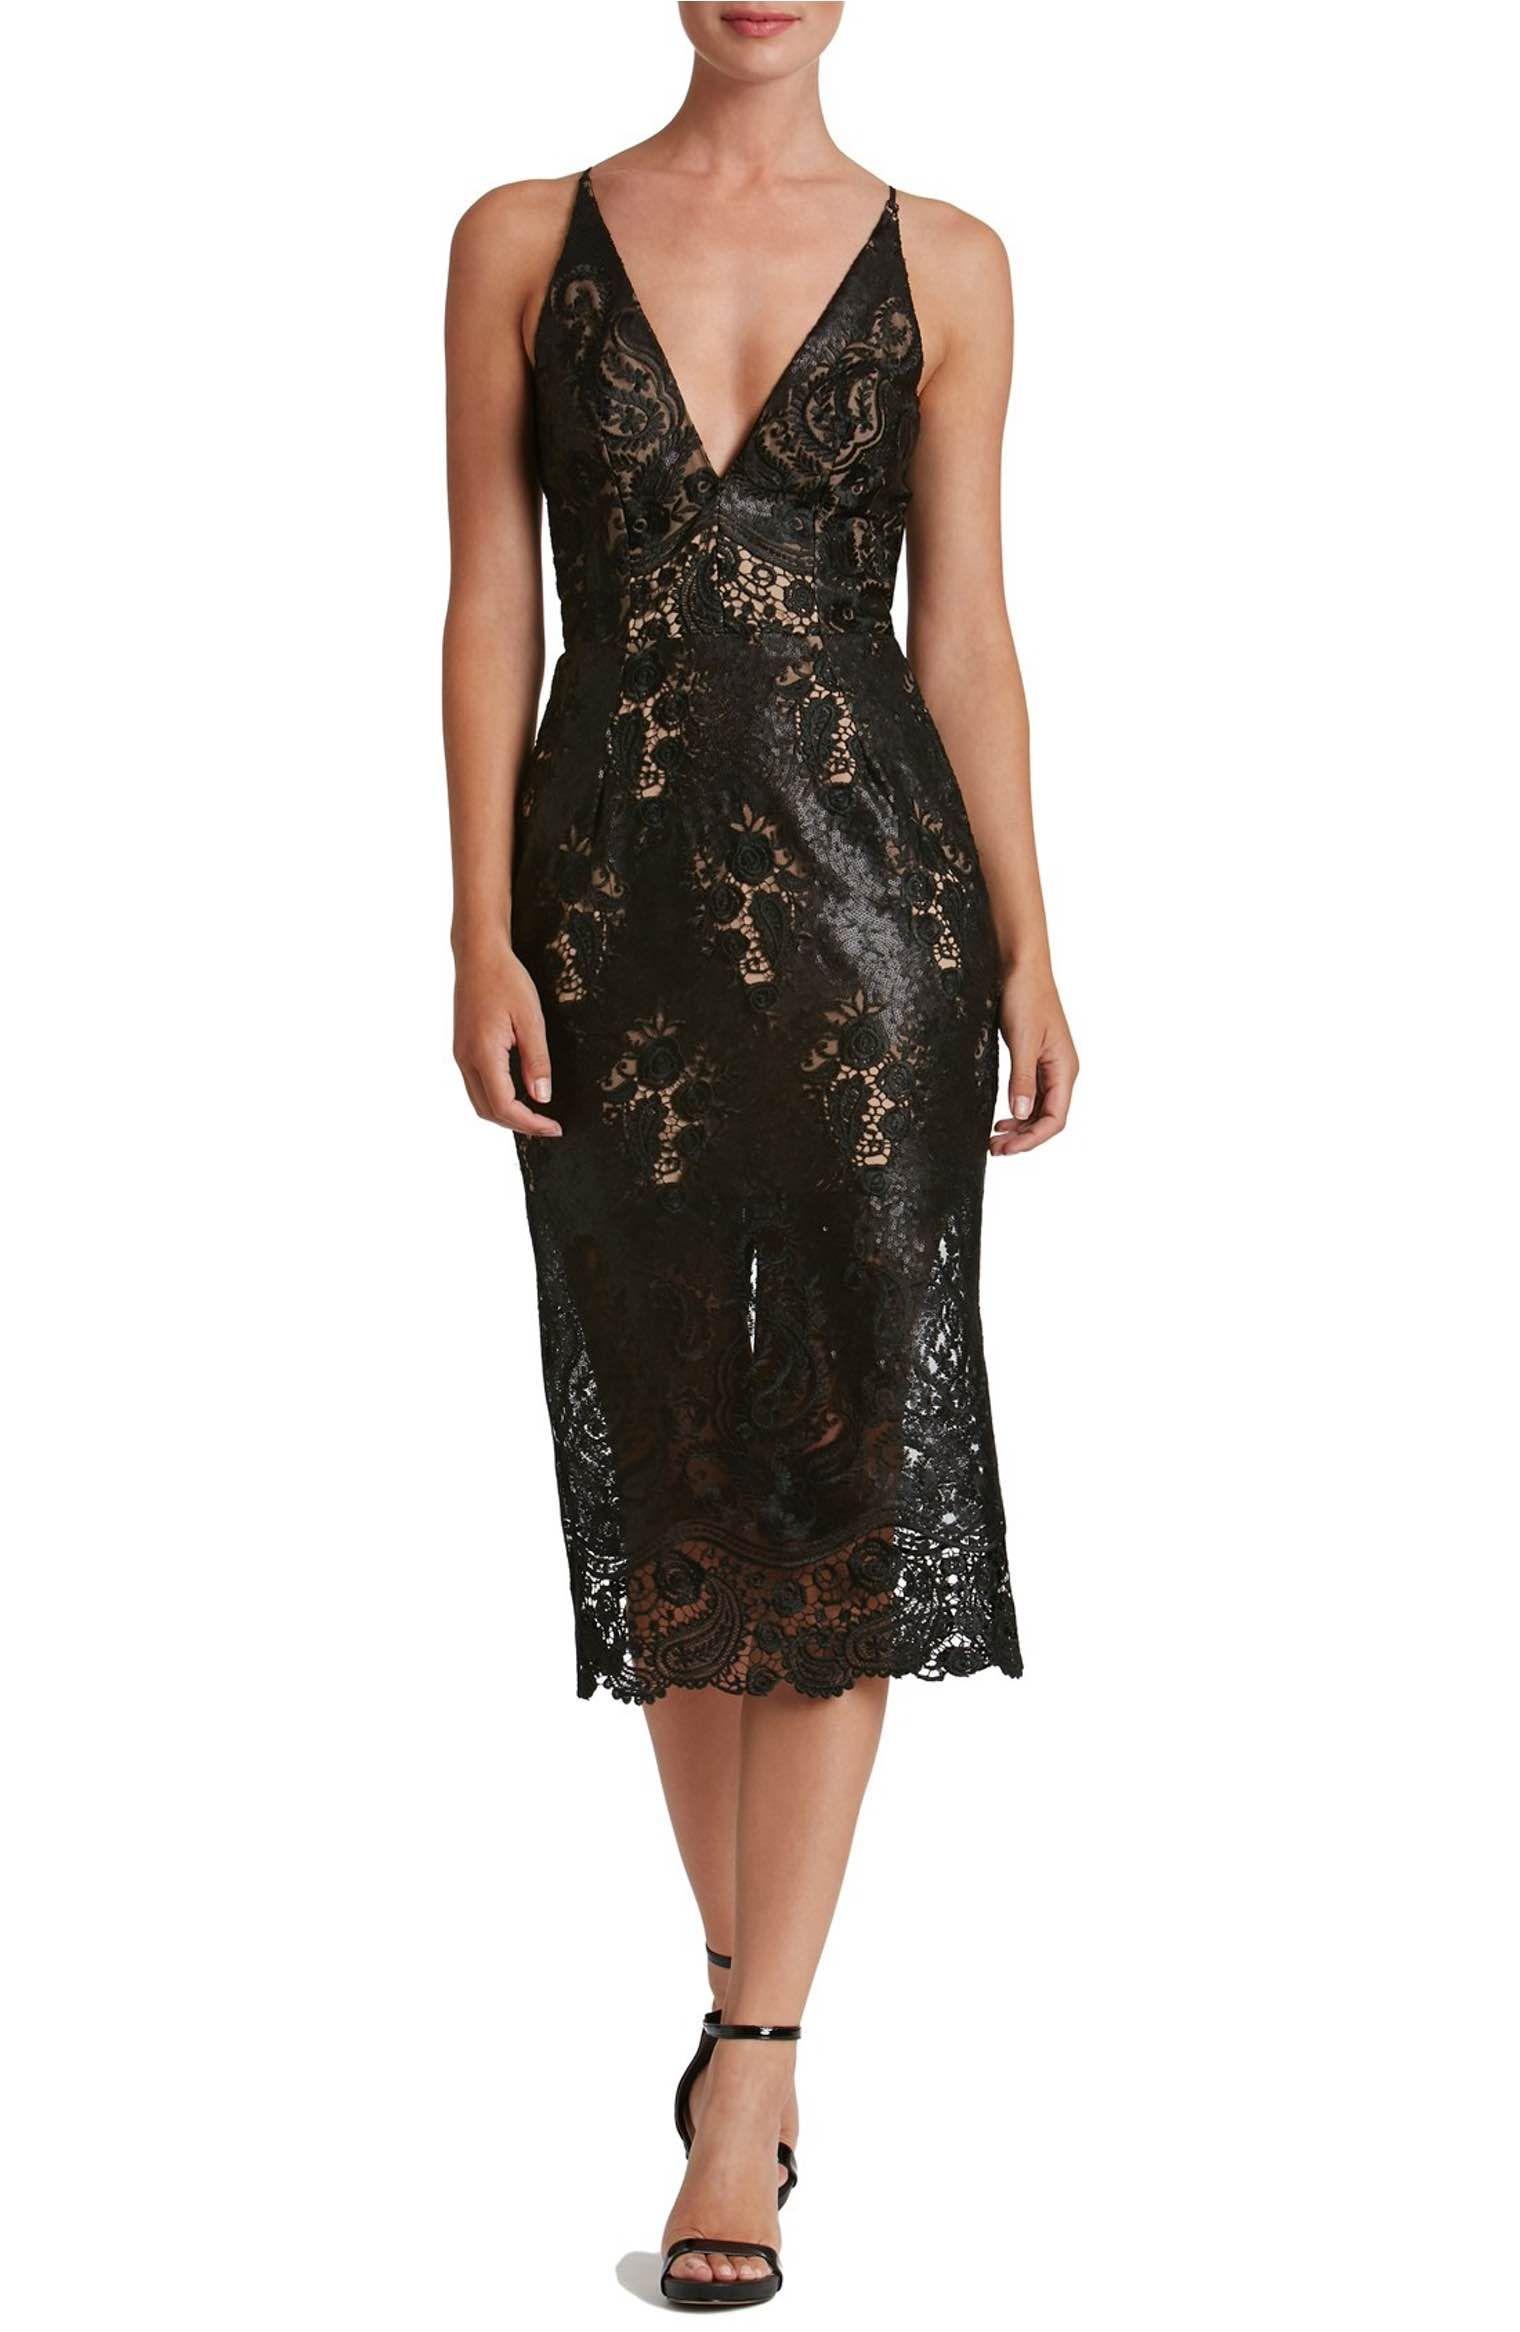 Main image dress the population angela sequin lace midi dress